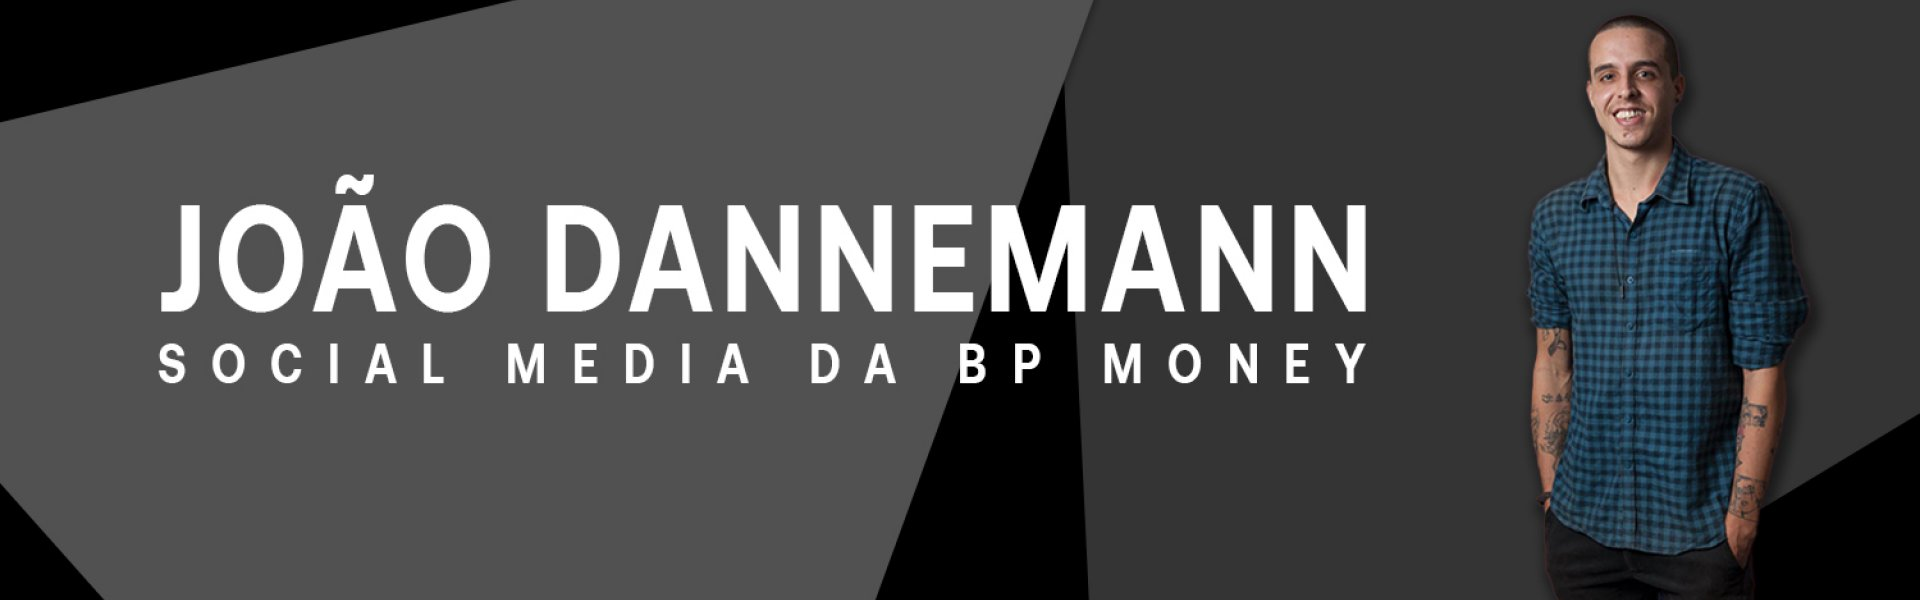 João Dannemann